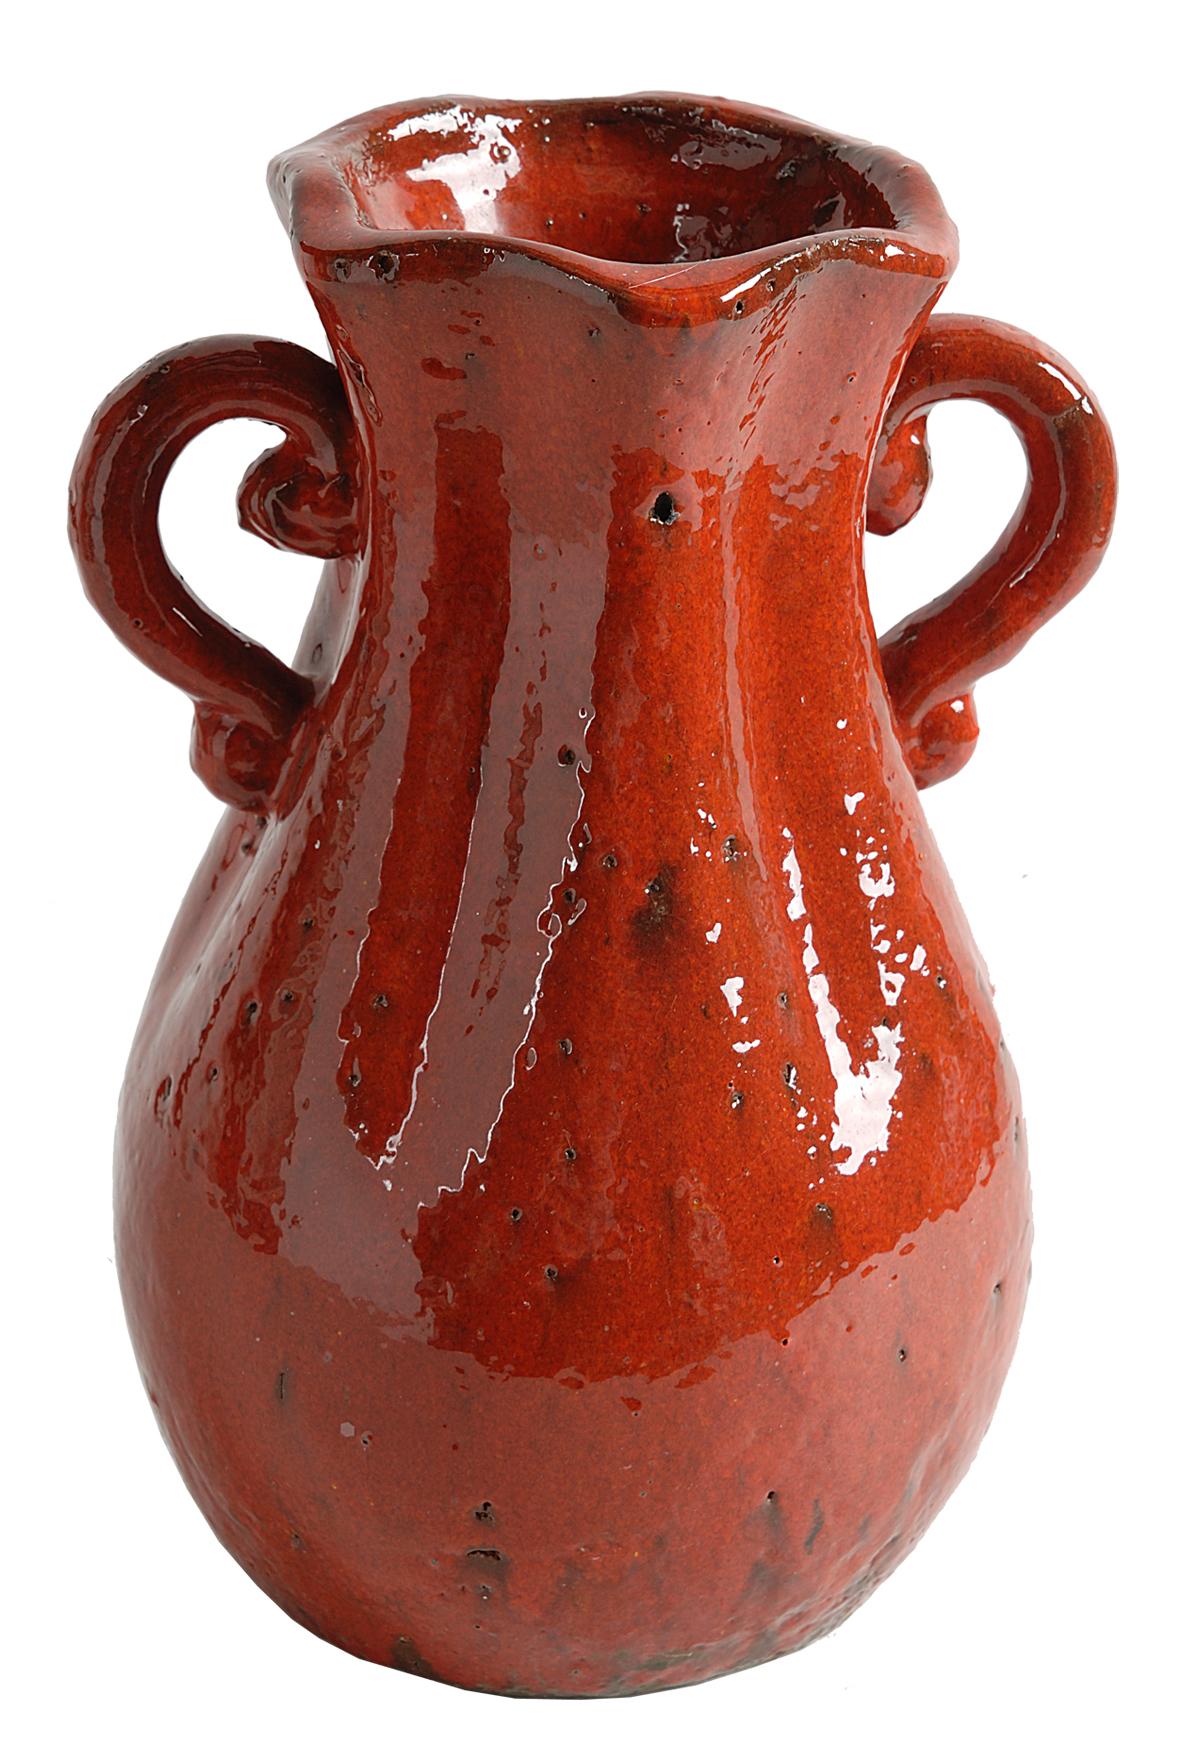 Вазы настольные Ваза декоративная Evergreen 67279-RED vaza-dekorativnaya-67279-red-ot-evergreen-niderlandy.jpg